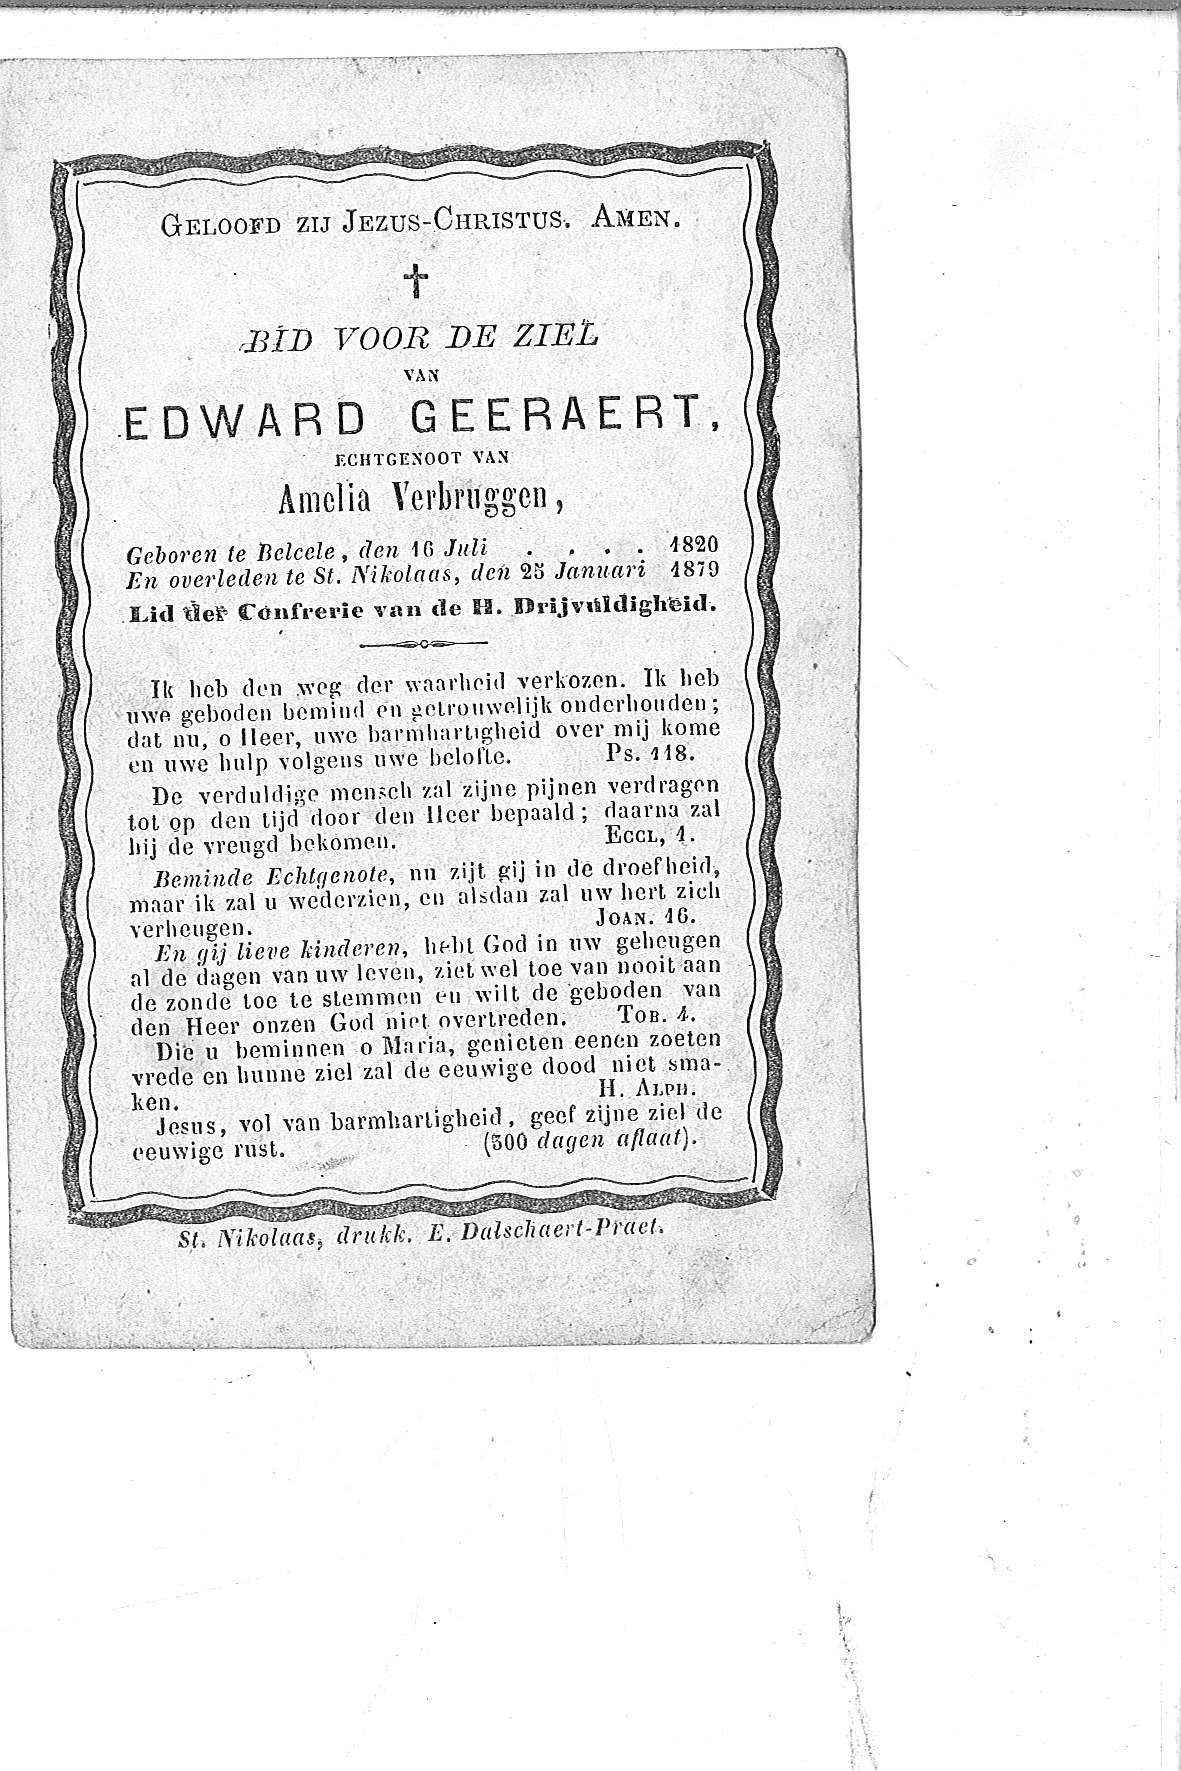 Edward(1879)20130604133153_00014.jpg